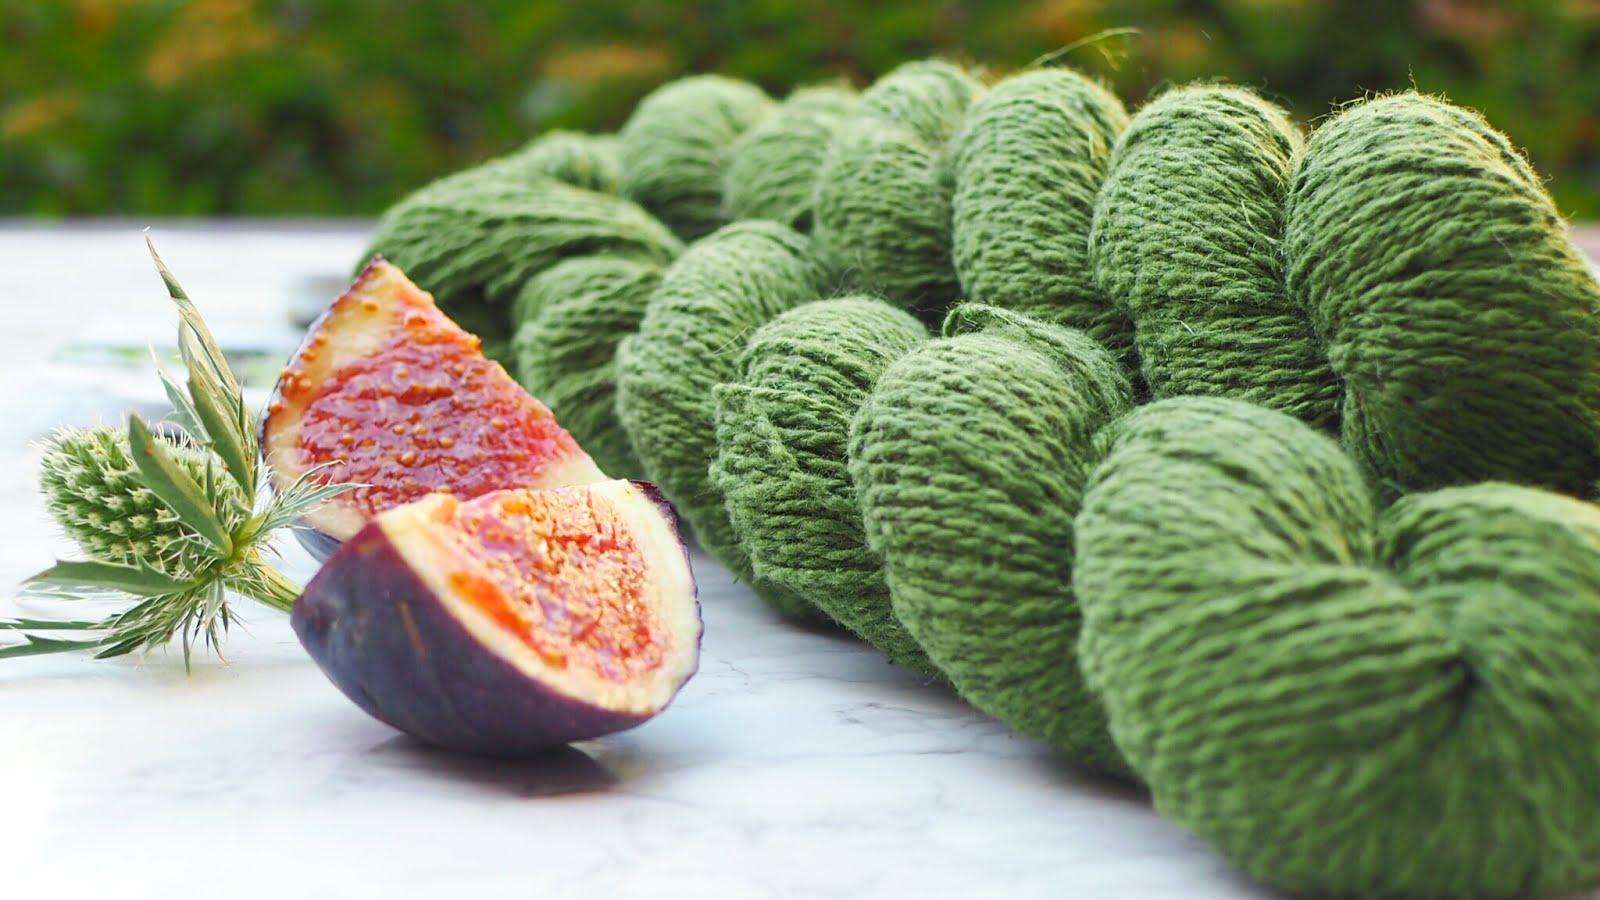 Pascuali Nepal in grün - Garn aus Brennesselfasern vegan